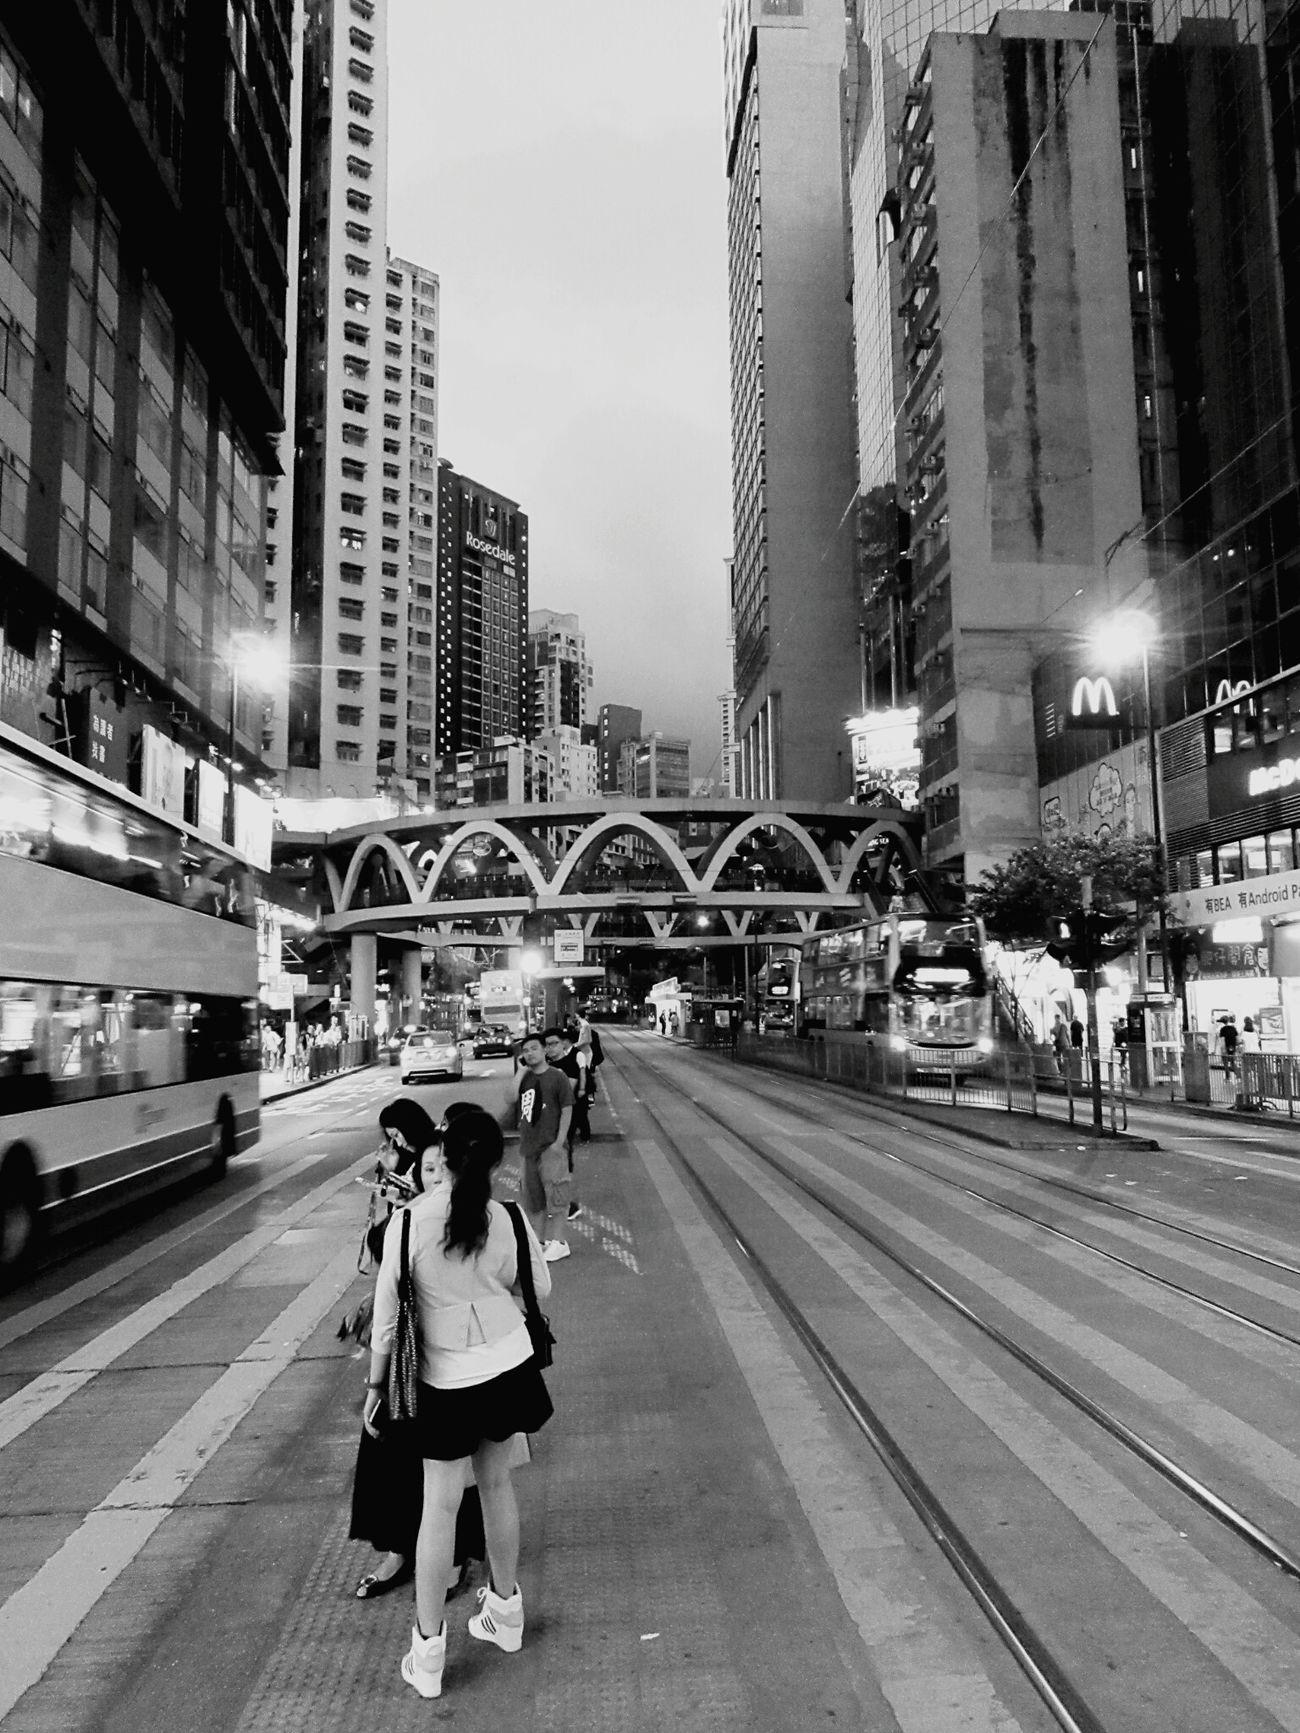 The Street Photographer - 2017 EyeEm Awards Public Transportation Hongkongstreet Hongkongcity Hong Kong City Hongkongcollection Hongkonglife Hongkongphotography HongKong Street Photography Blackandwhite Photography Blackandwhite Fortheloveofblackandwhite Hongkong Black&white Black And White B&w Street Photography Hongkongskyline